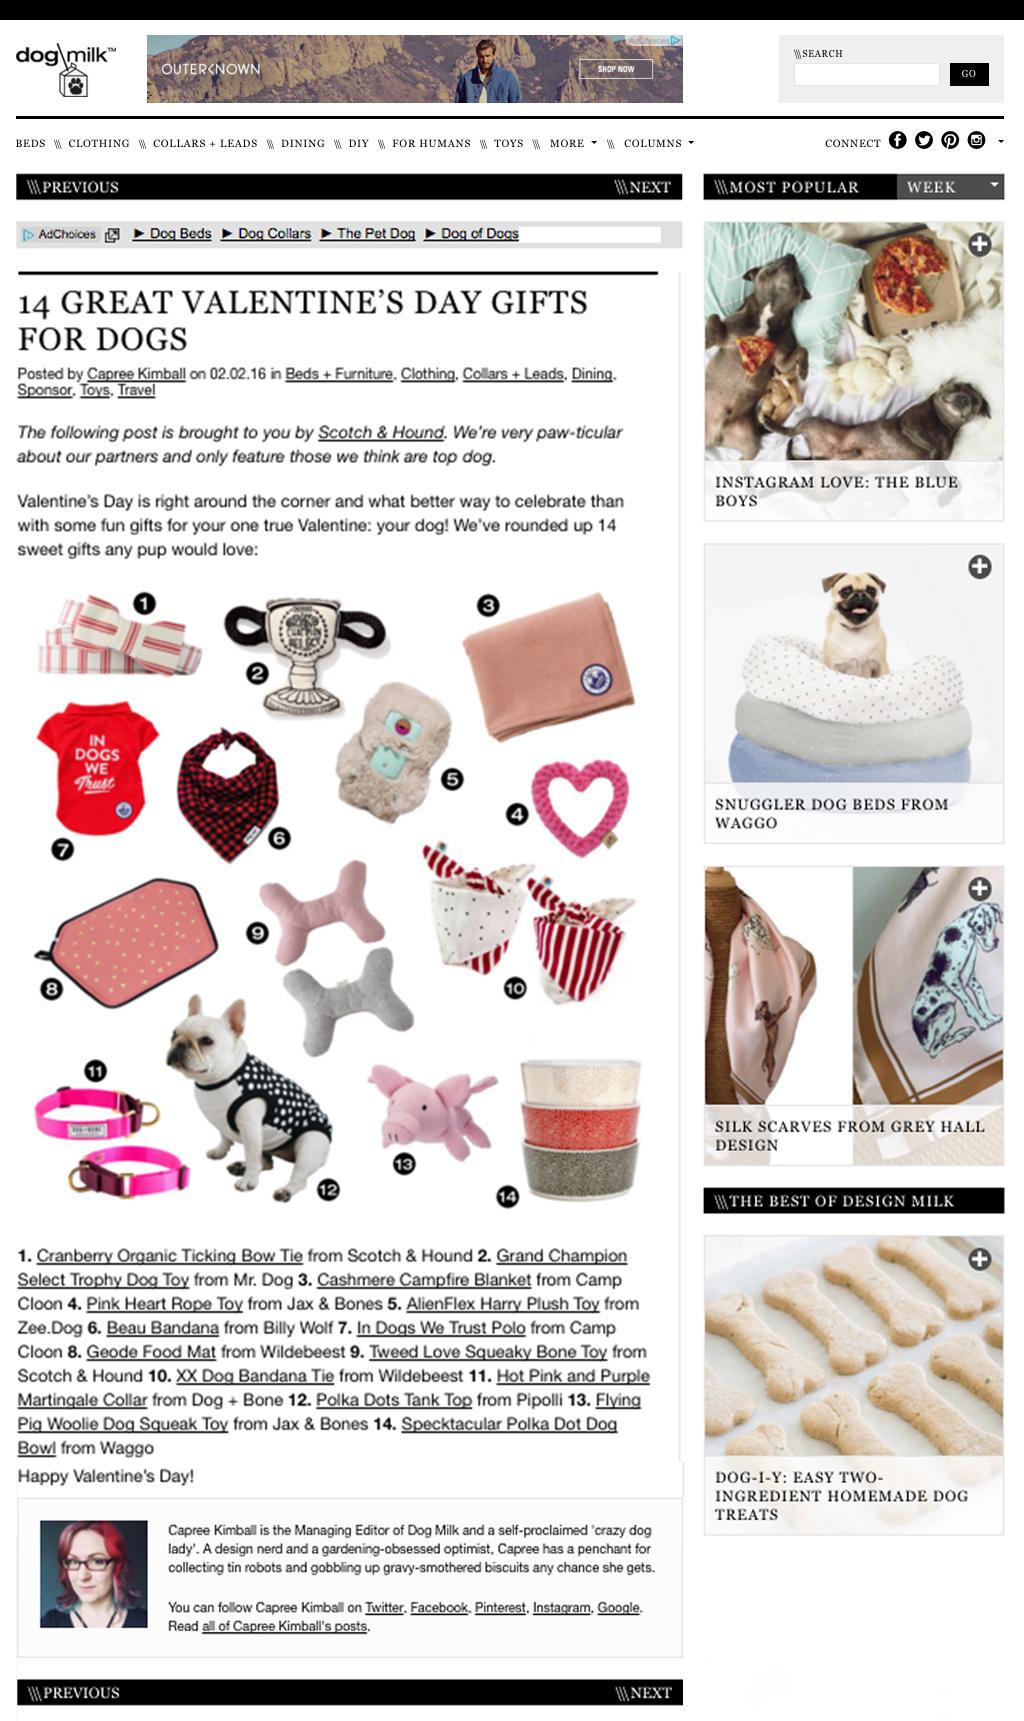 DogMilk_ValentinesGiftGuide_February2016